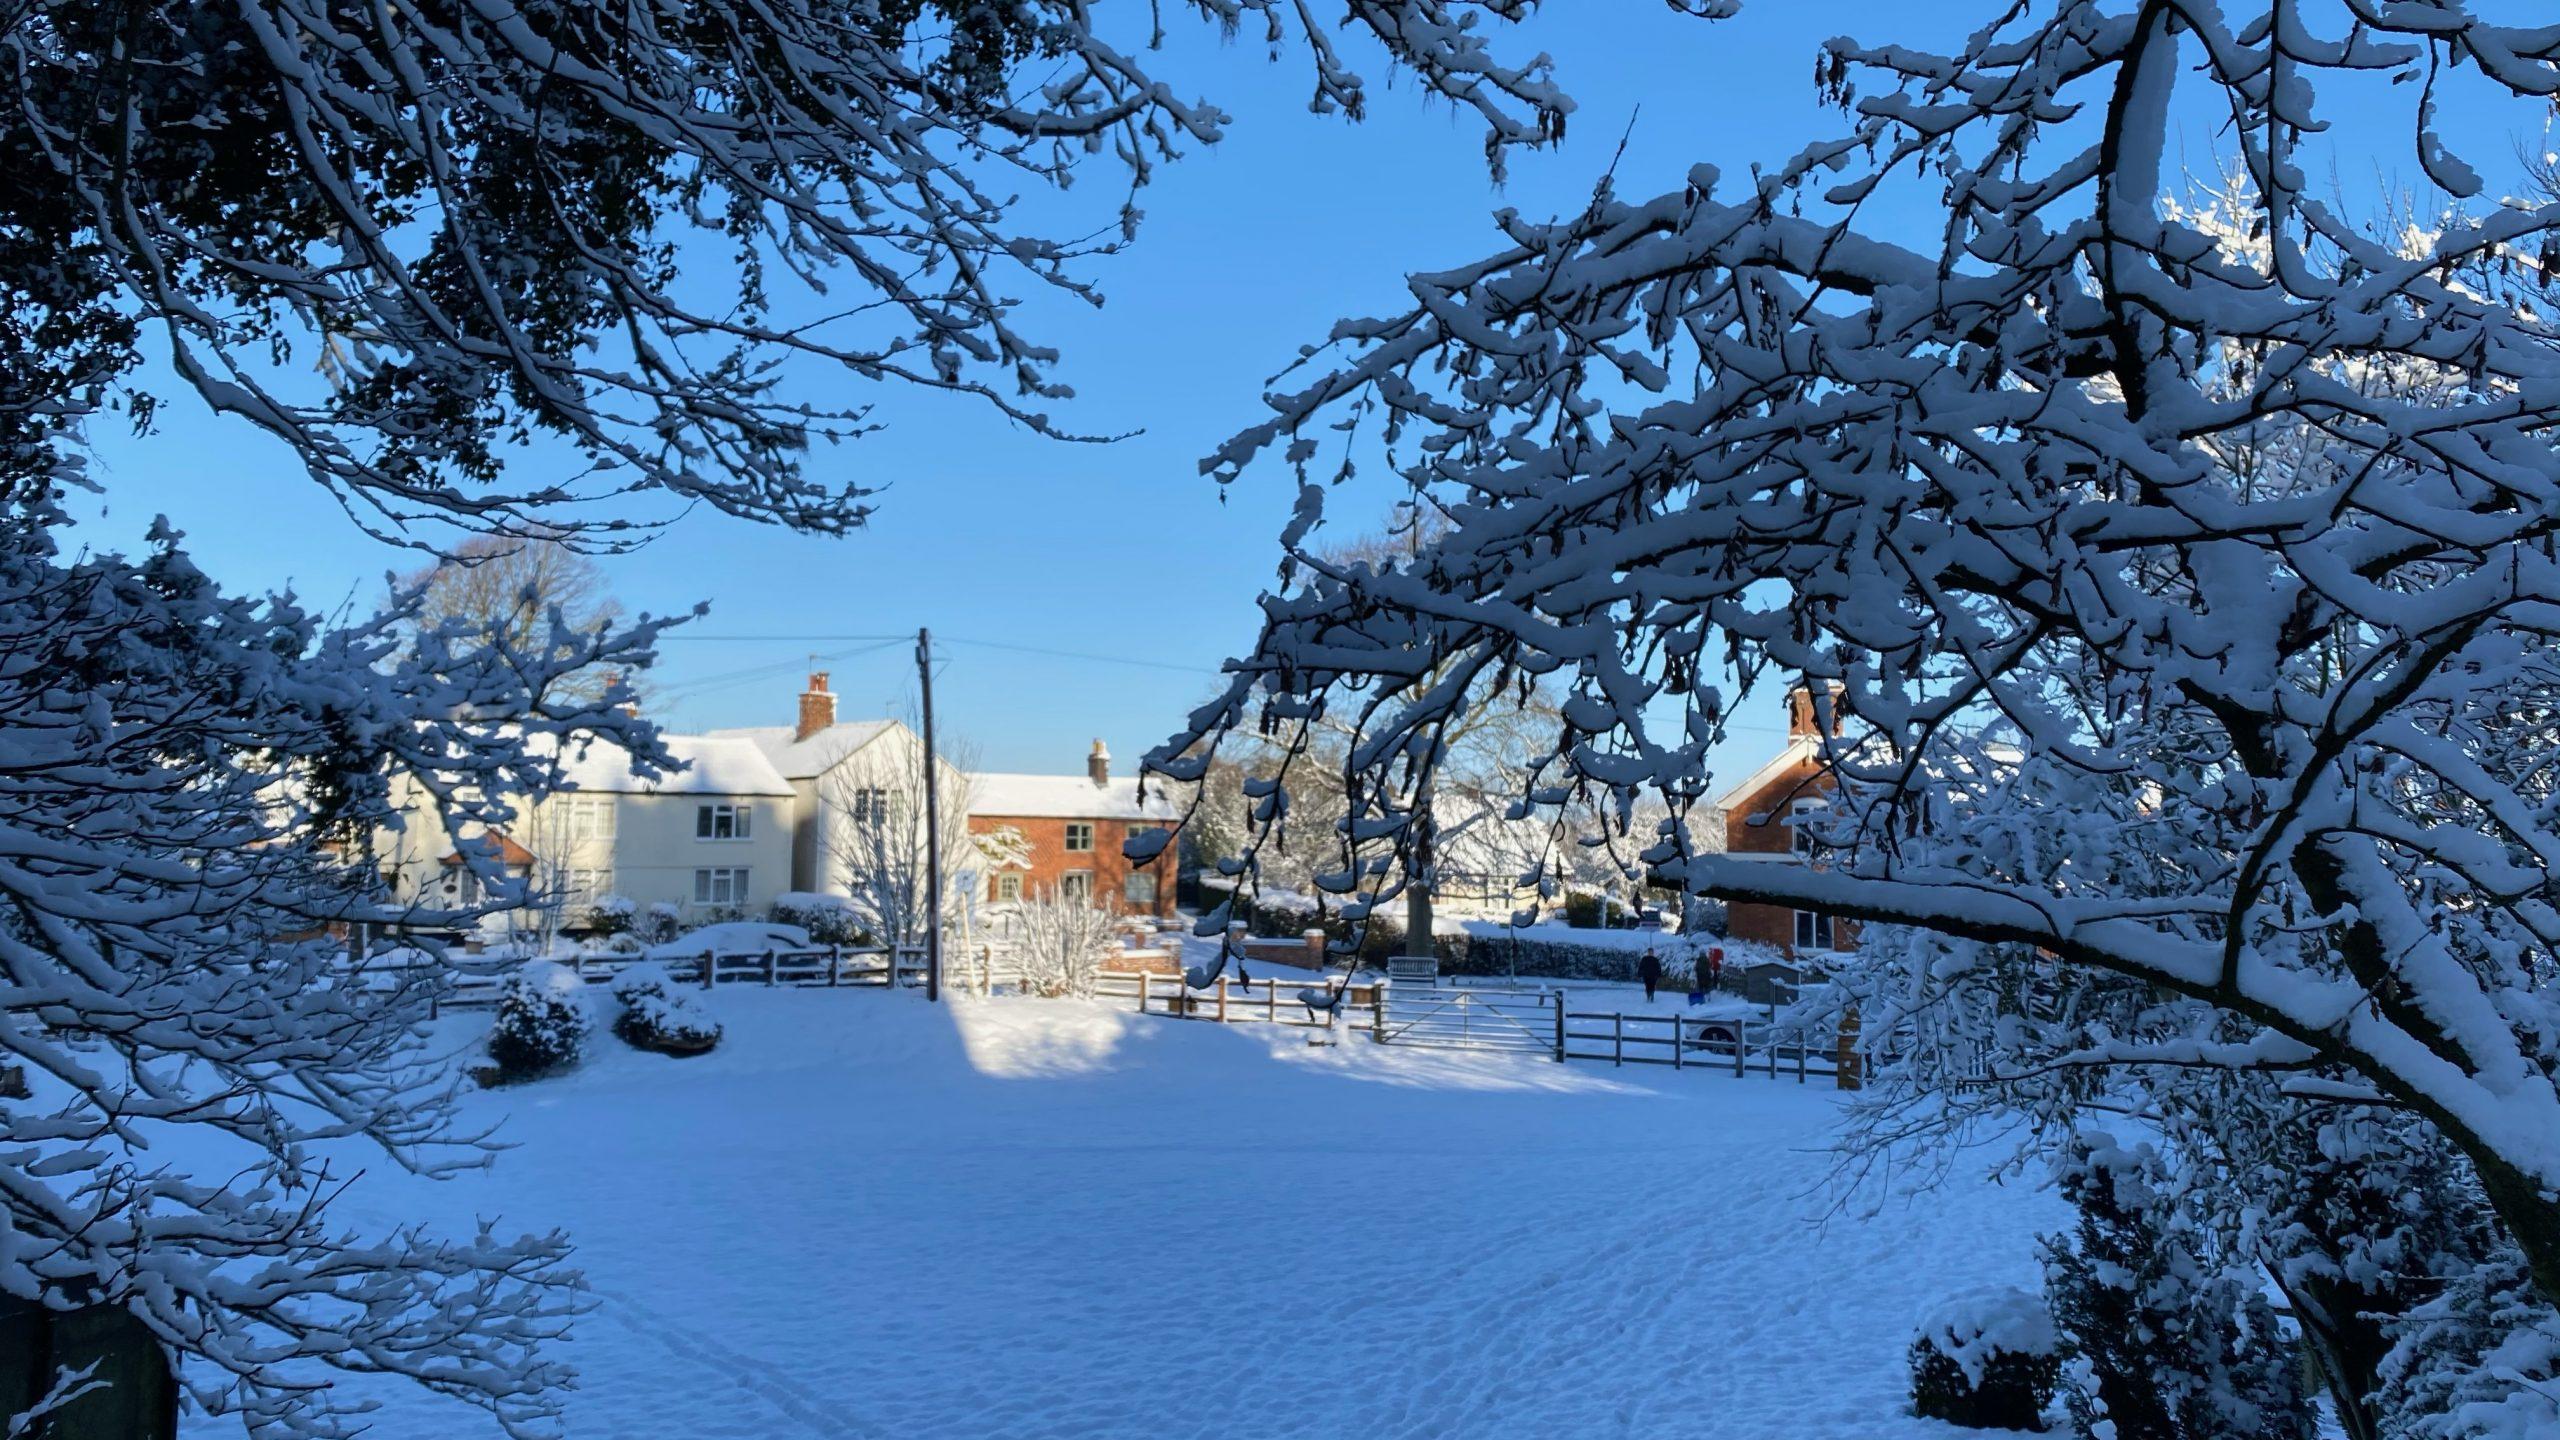 Marriott Green & Main Street in the Snow